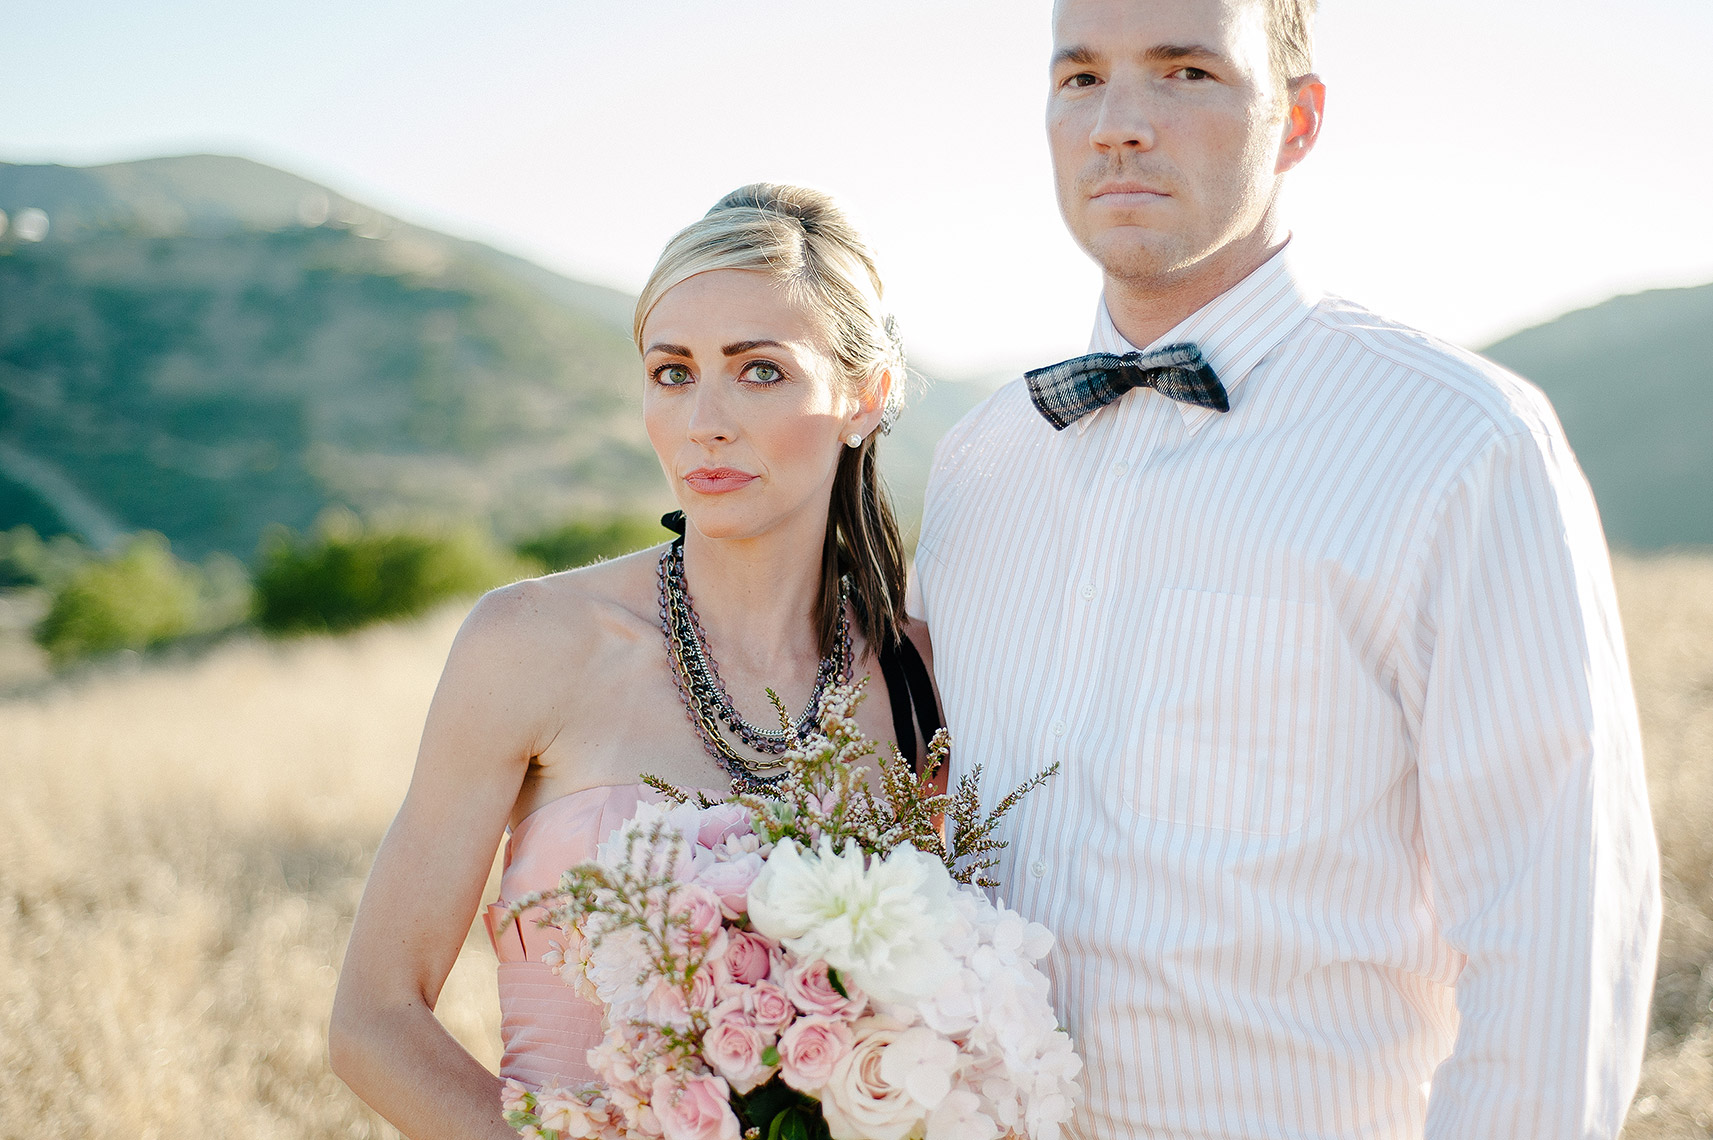 john-schnack-photography-san-diego-wedding-inspiration-shoot-back-country-vintage-wedding-34.jpg